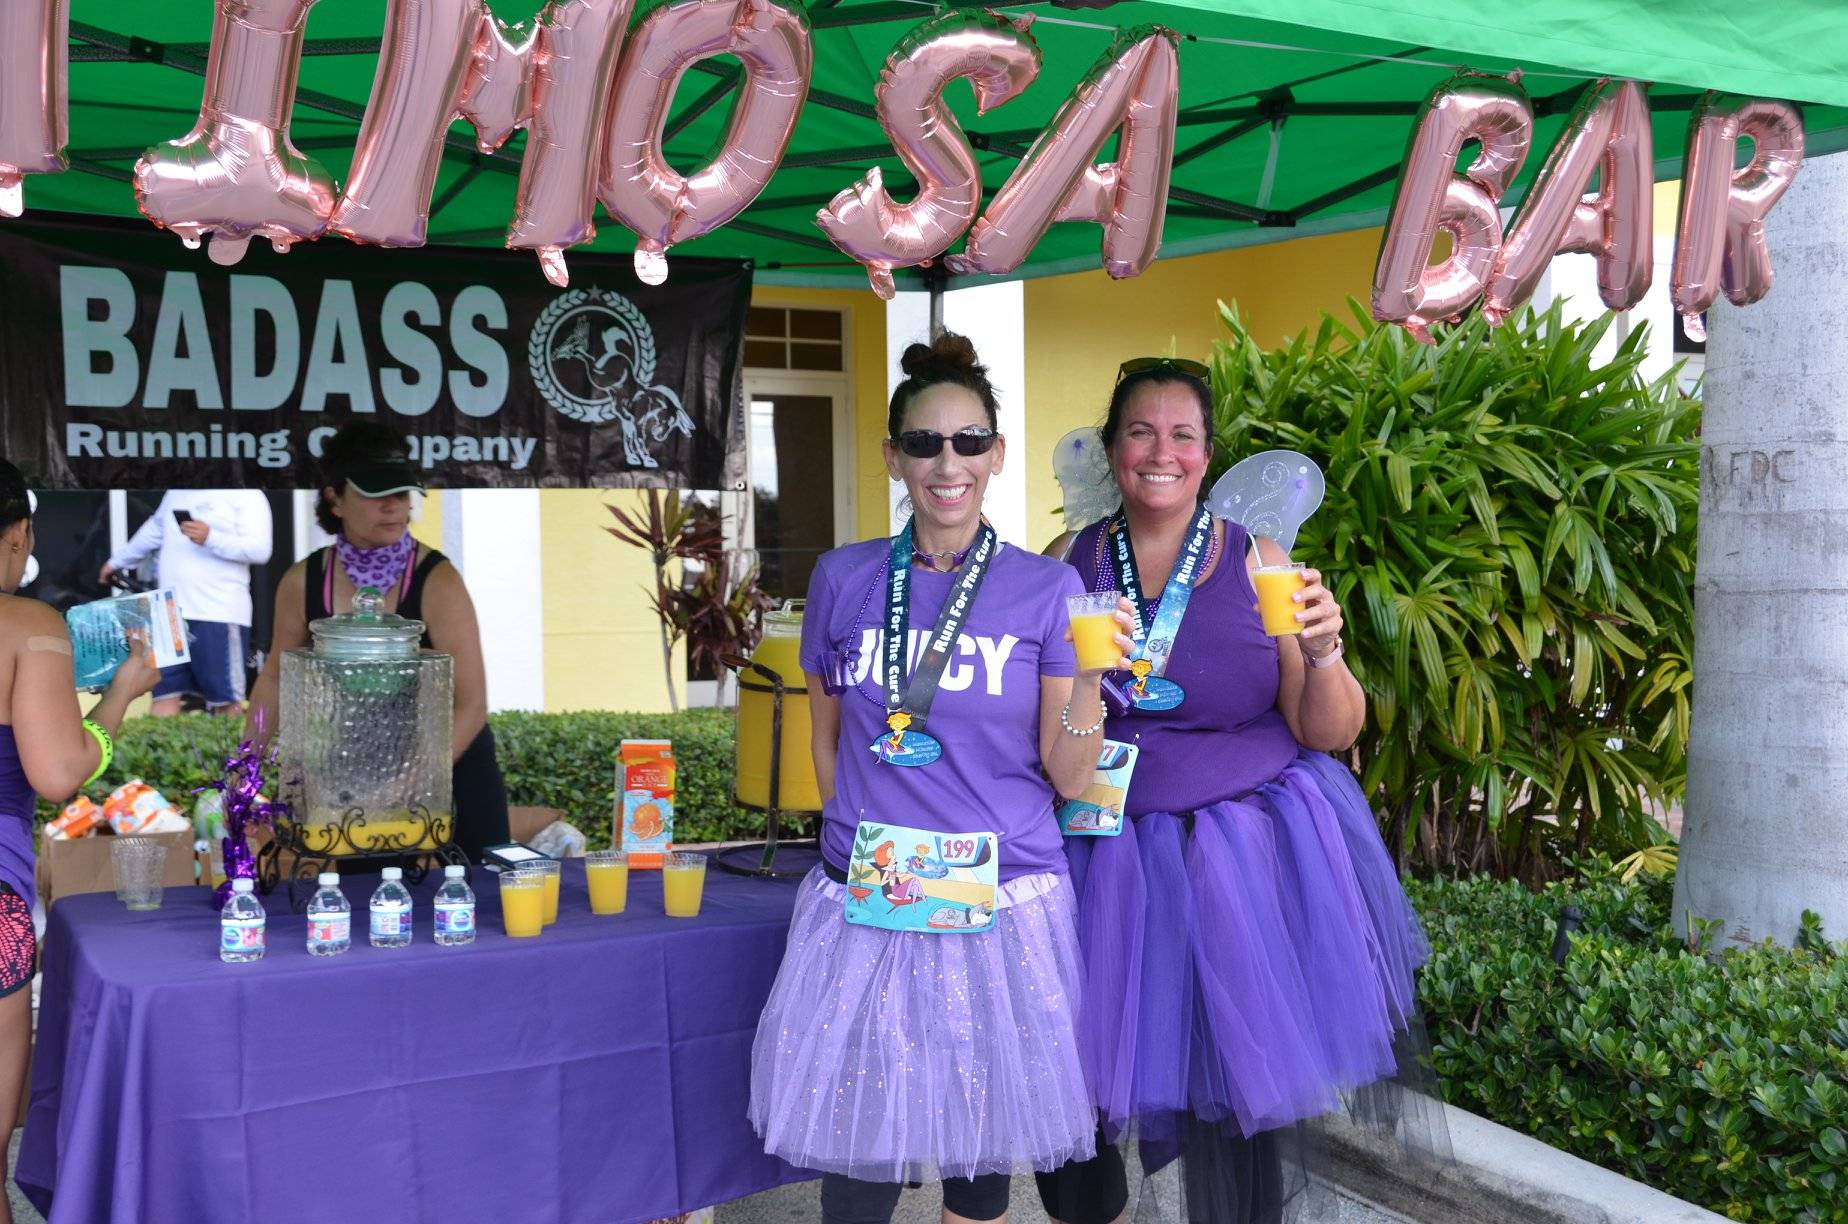 Mamacita Mimosa Charity 5K